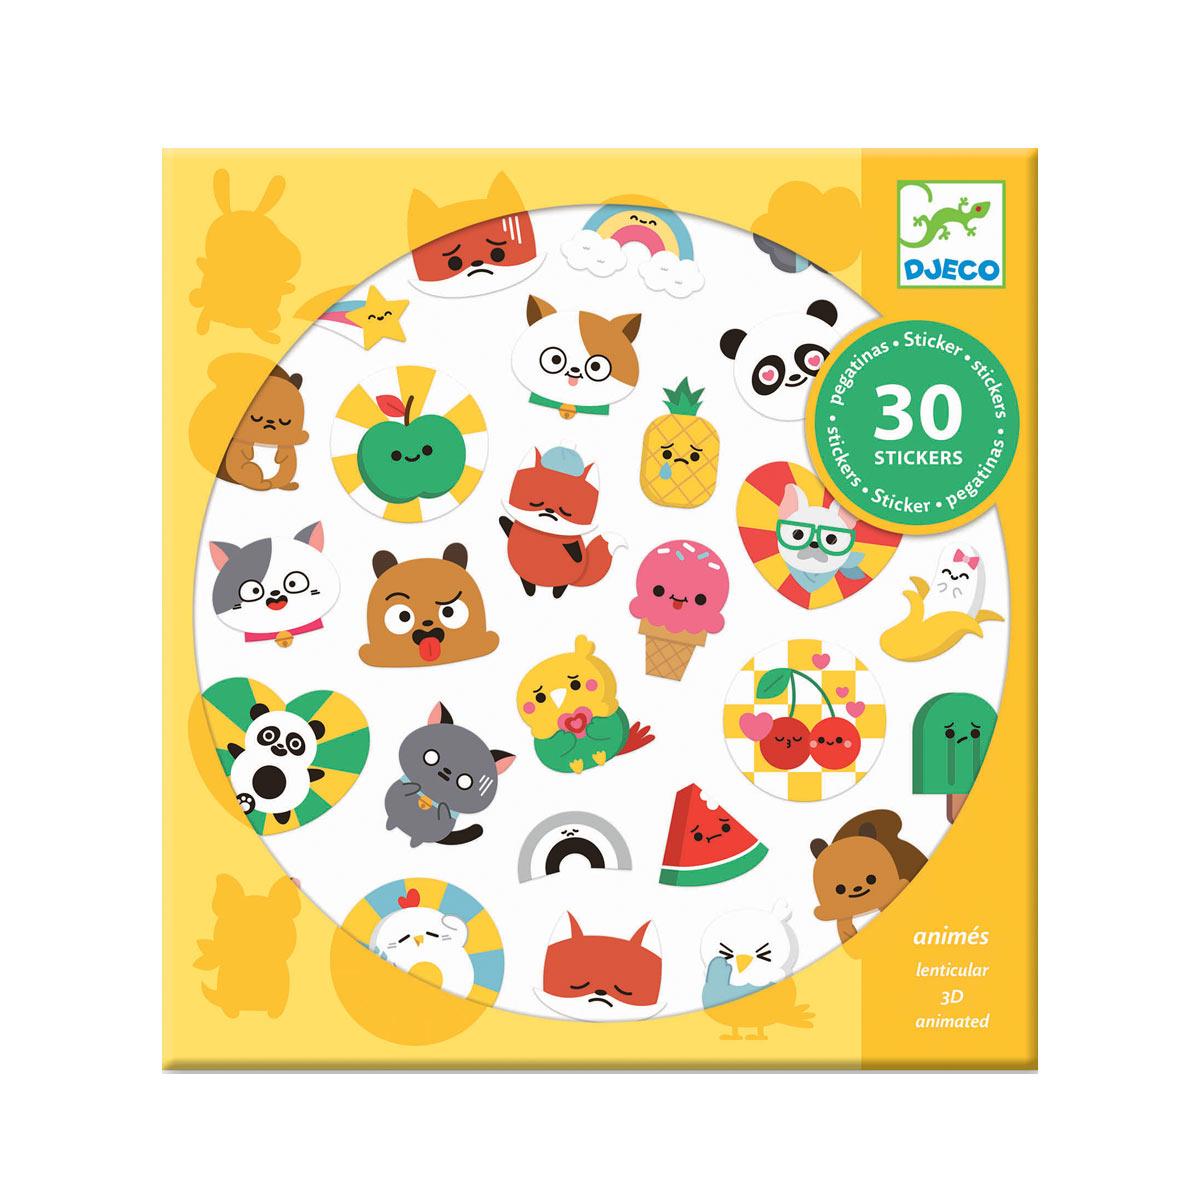 Pochette 30 stickers lenticulaires